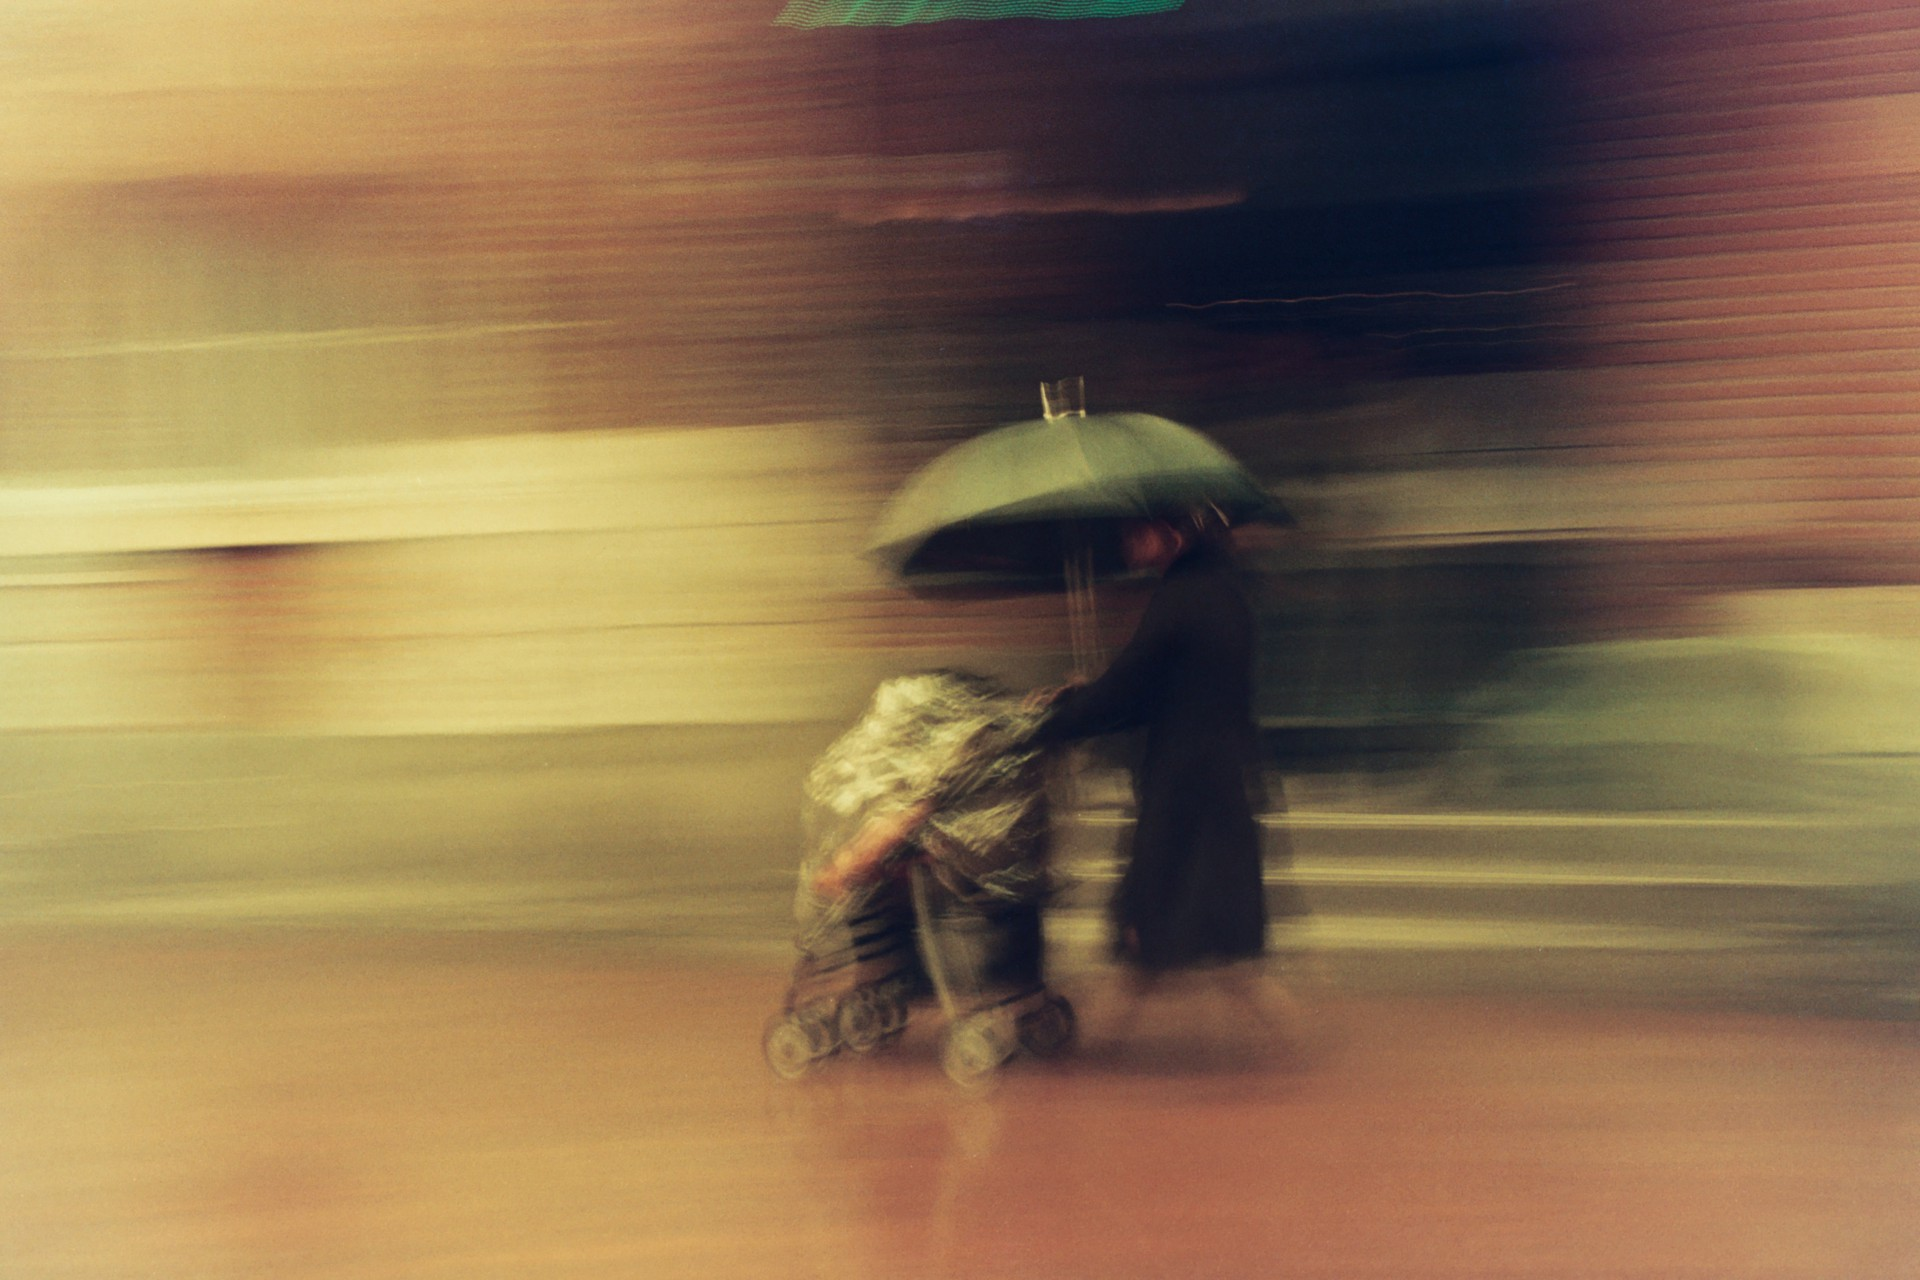 Rainy Day | Copyright © David Allen